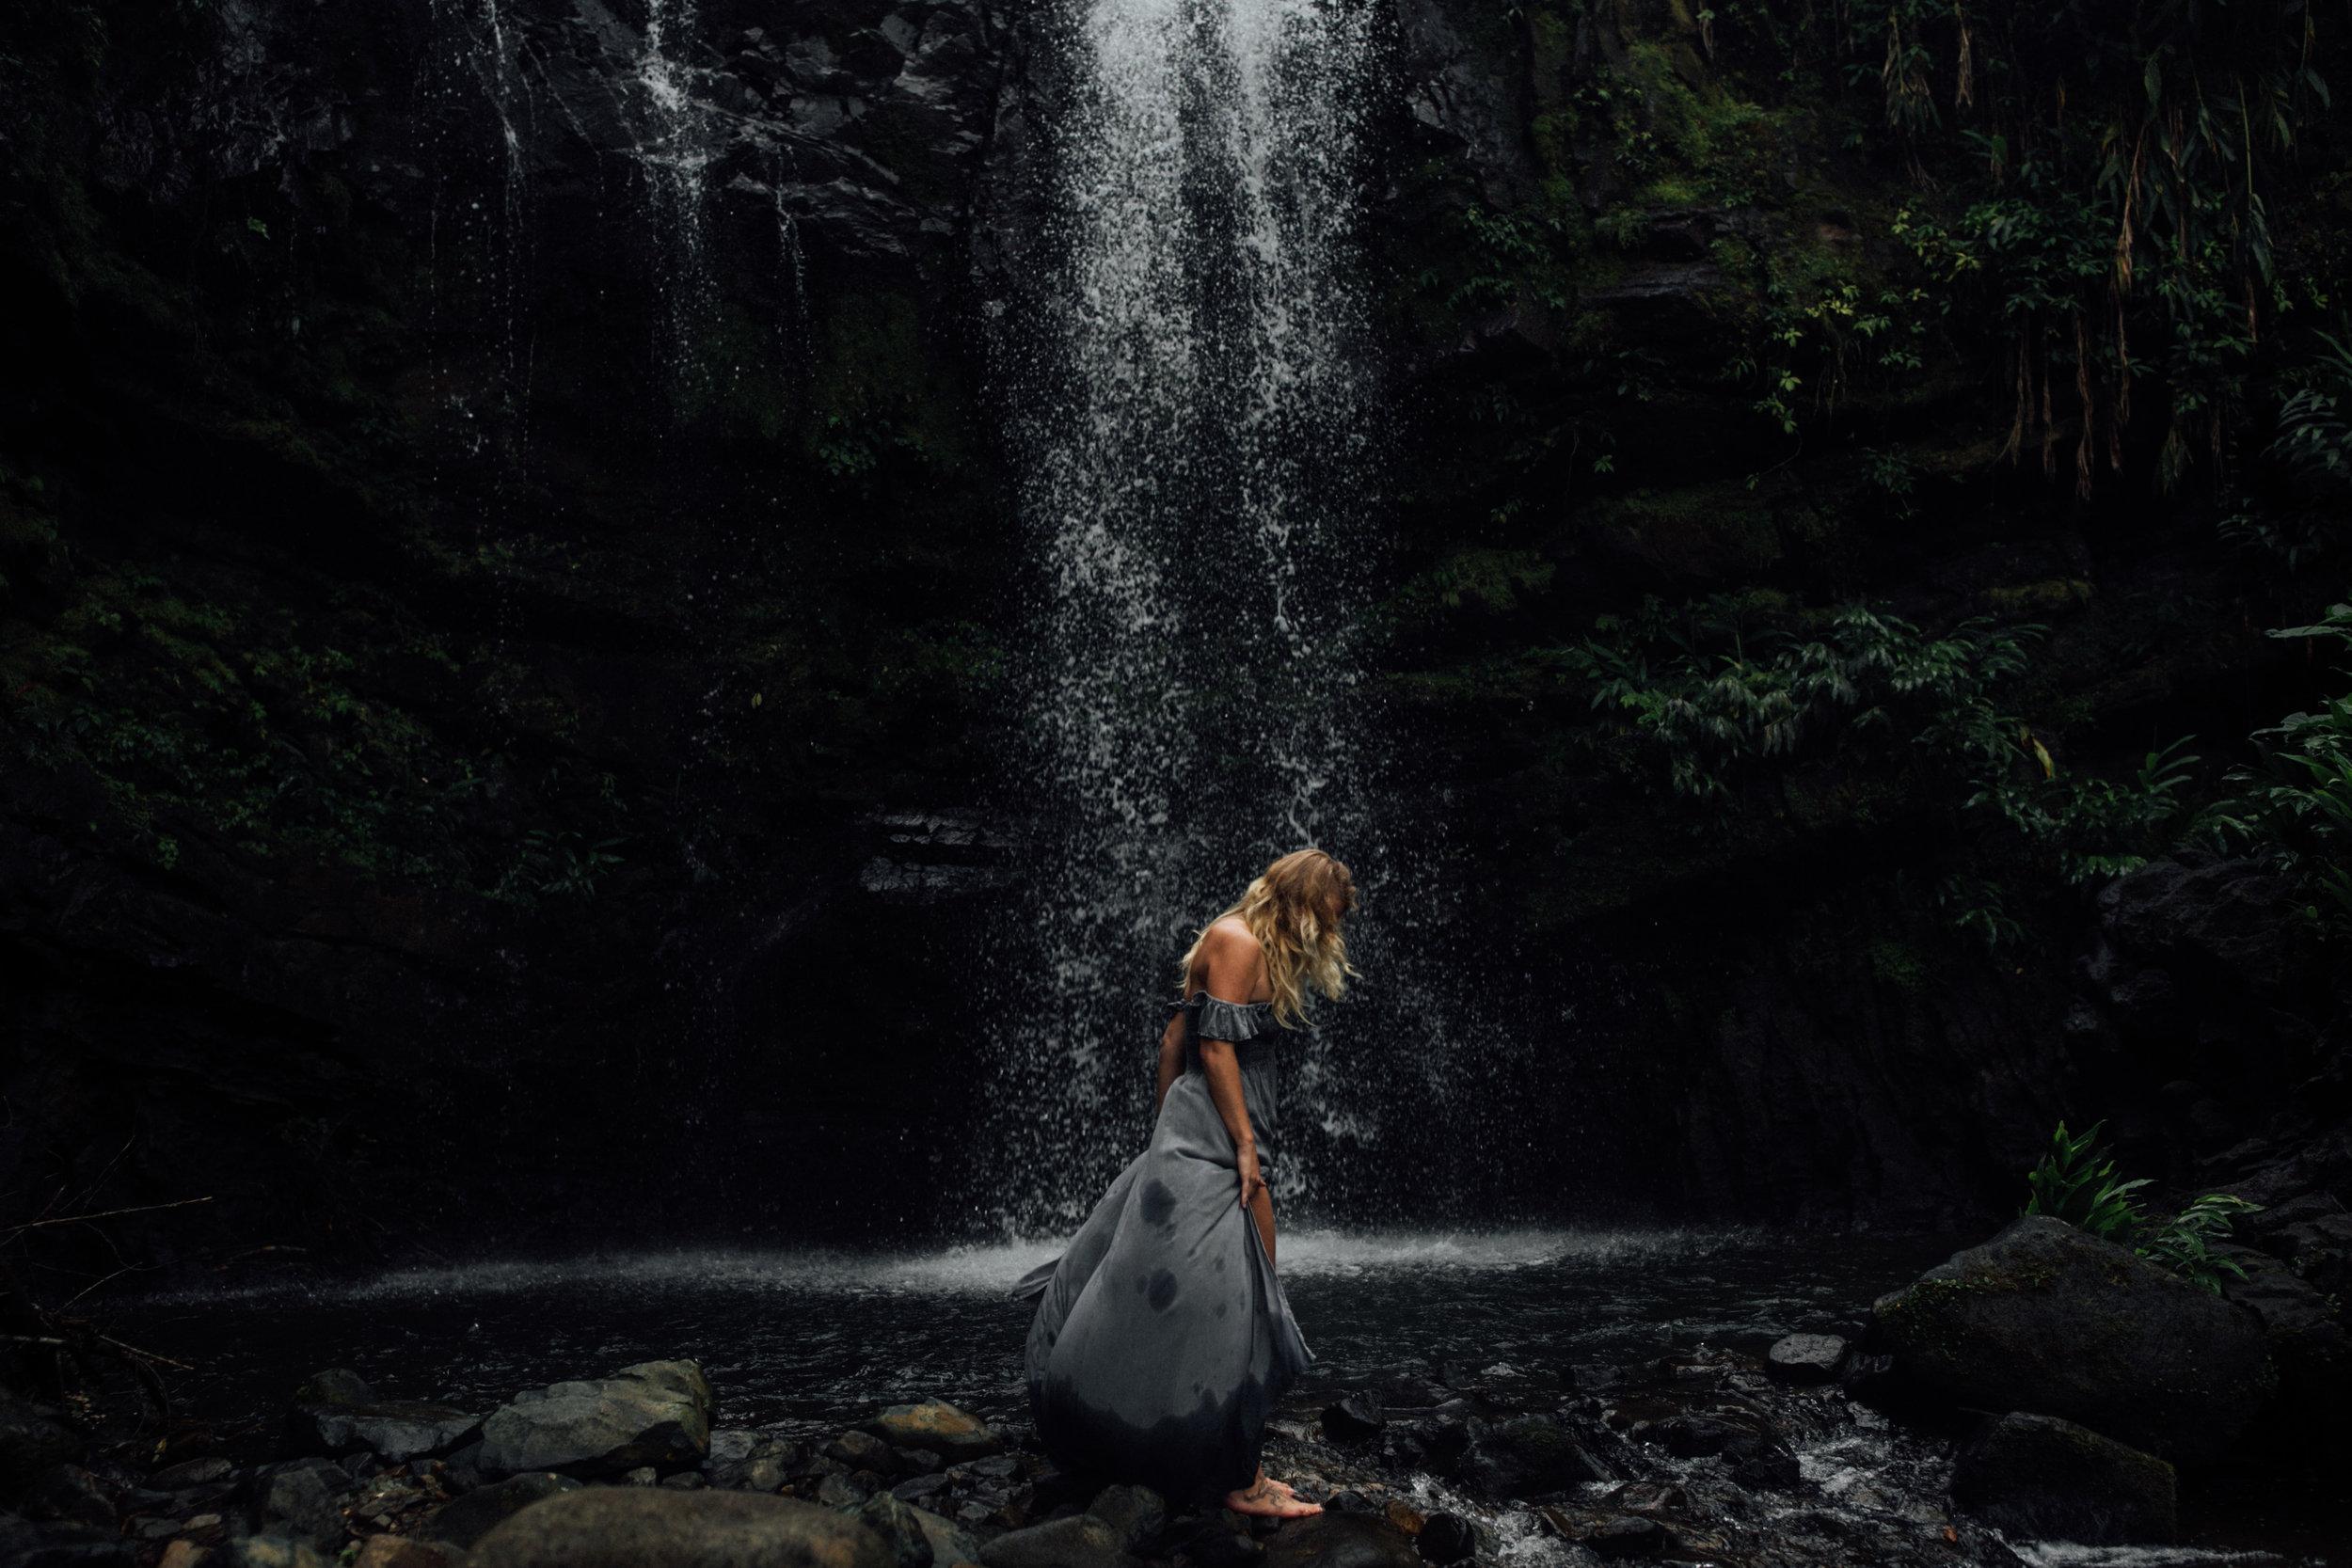 waterfall-self-10.jpg